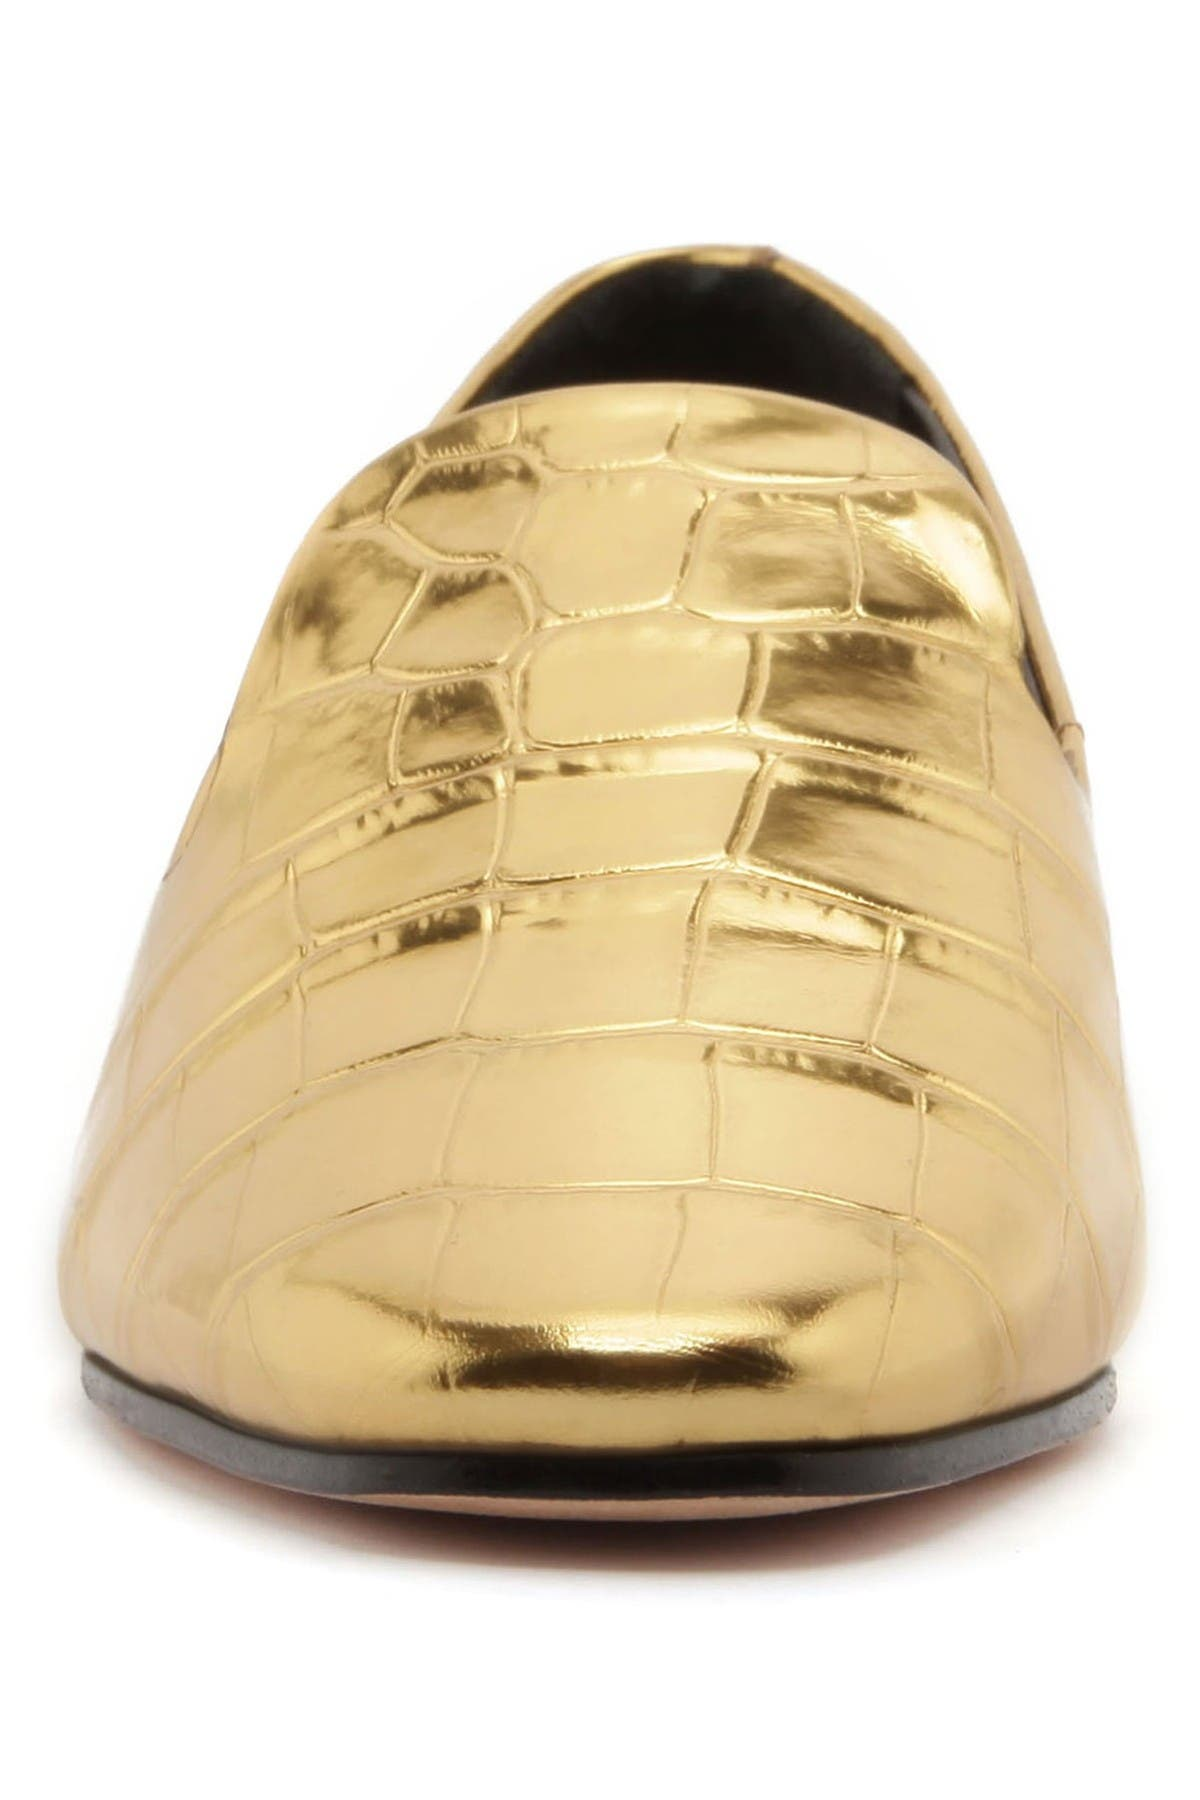 Image of Schutz Flor Metallic Croc Embossed Leather Loafer